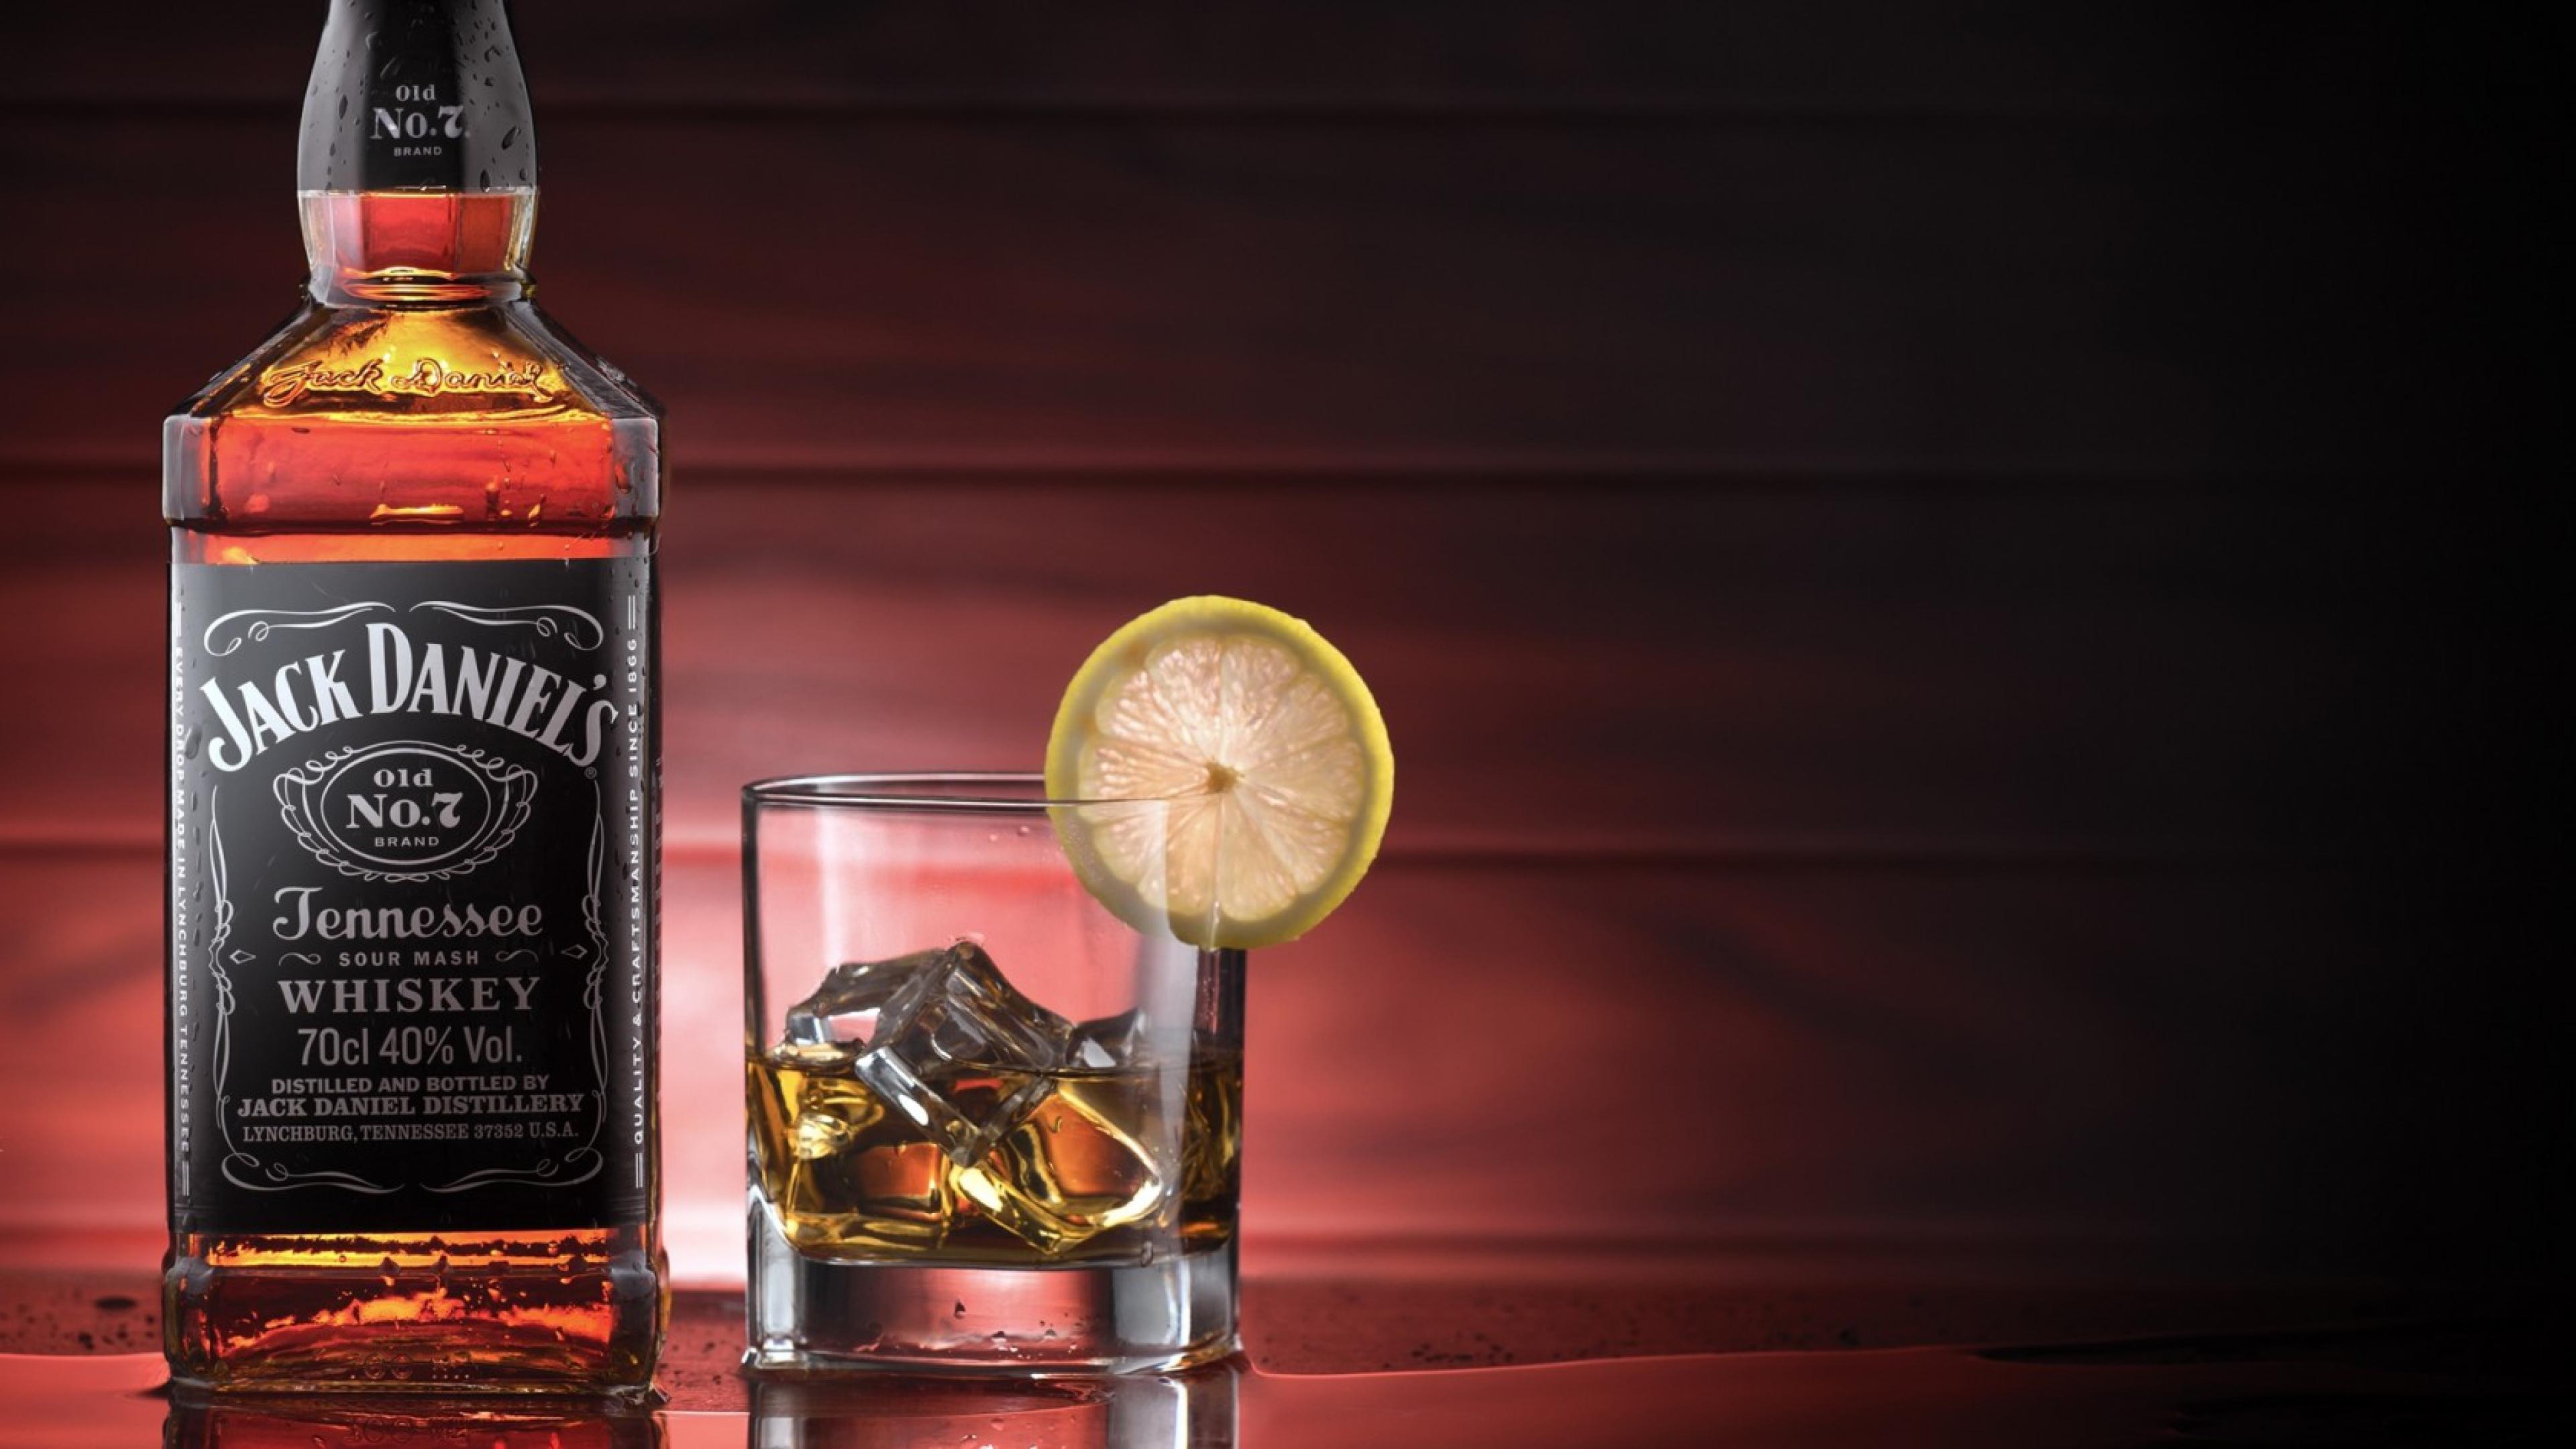 jack daniels whisky background wallpaper 66301